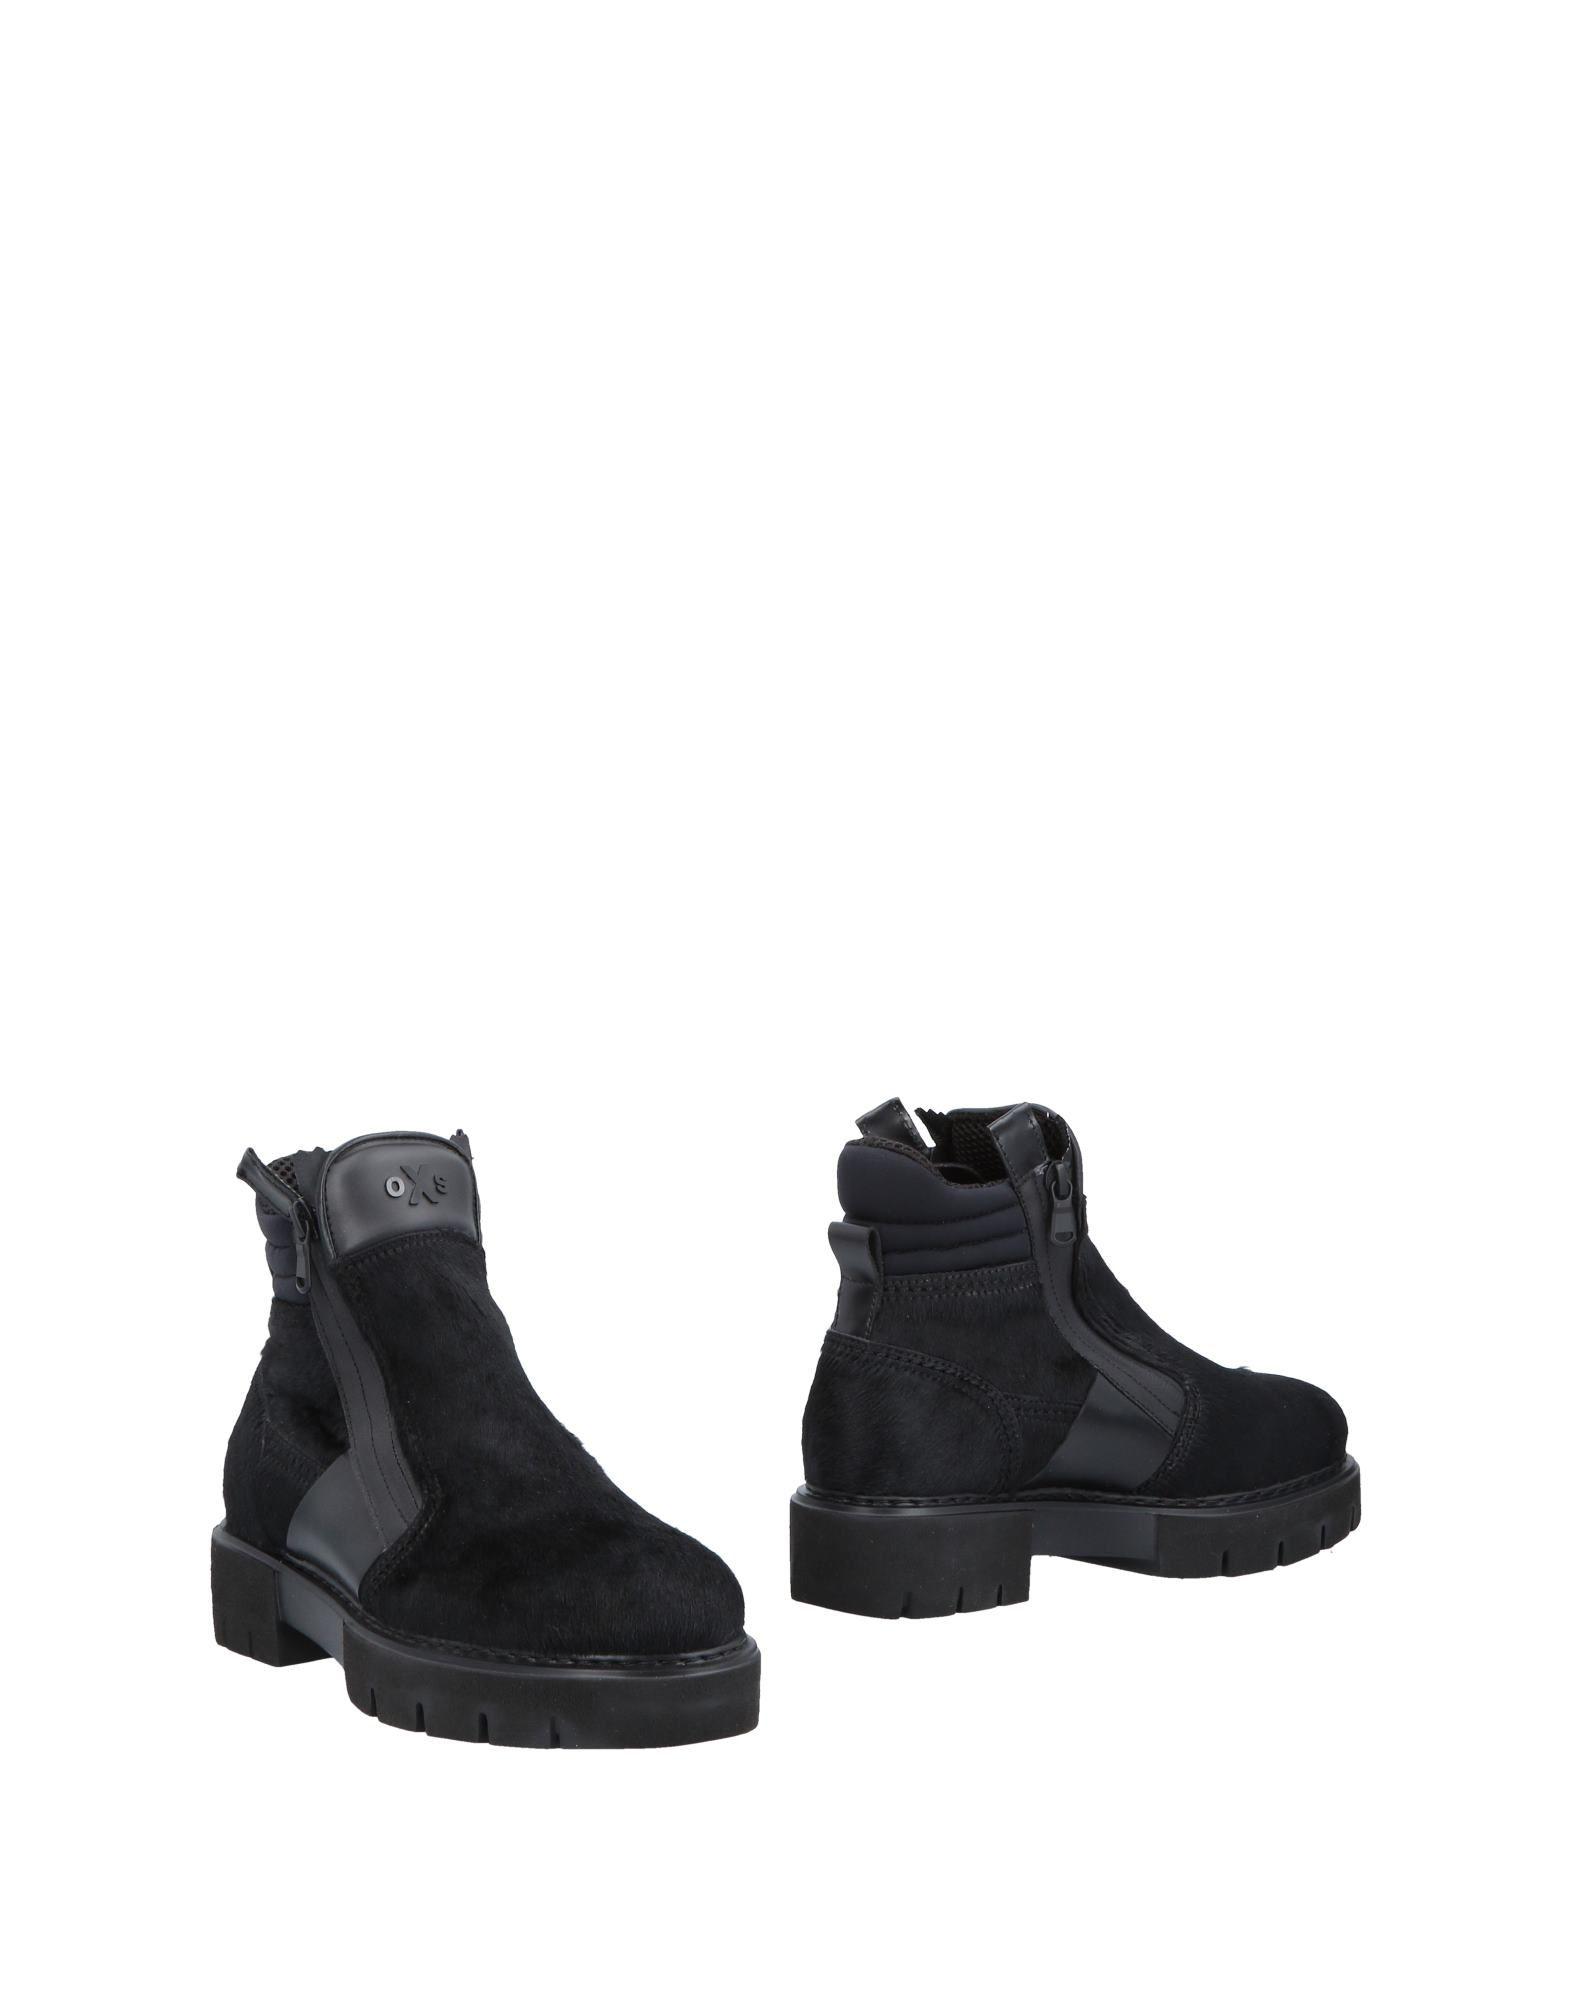 Stilvolle billige Schuhe 11501445XG O.X.S. Stiefelette Damen  11501445XG Schuhe f8c909